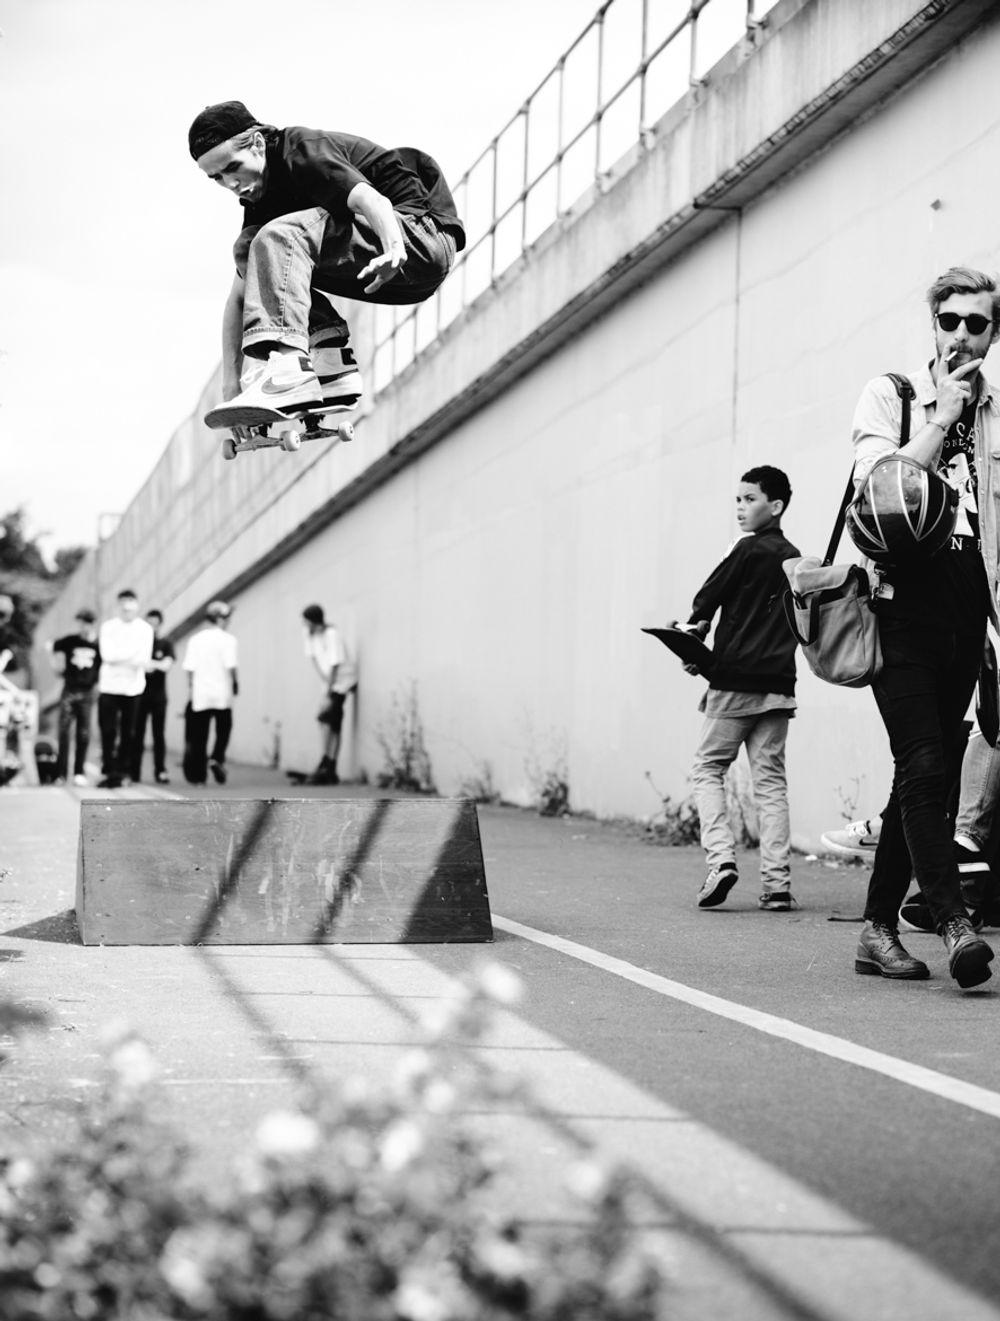 _IHC7547e-Donovon-Piscopo-Shifty-Ollie-Nike-SB-x-Slam-City-Skates-Go-Skateboarding-Day-London-June-2015-Photographer-Maksim-Kalanep